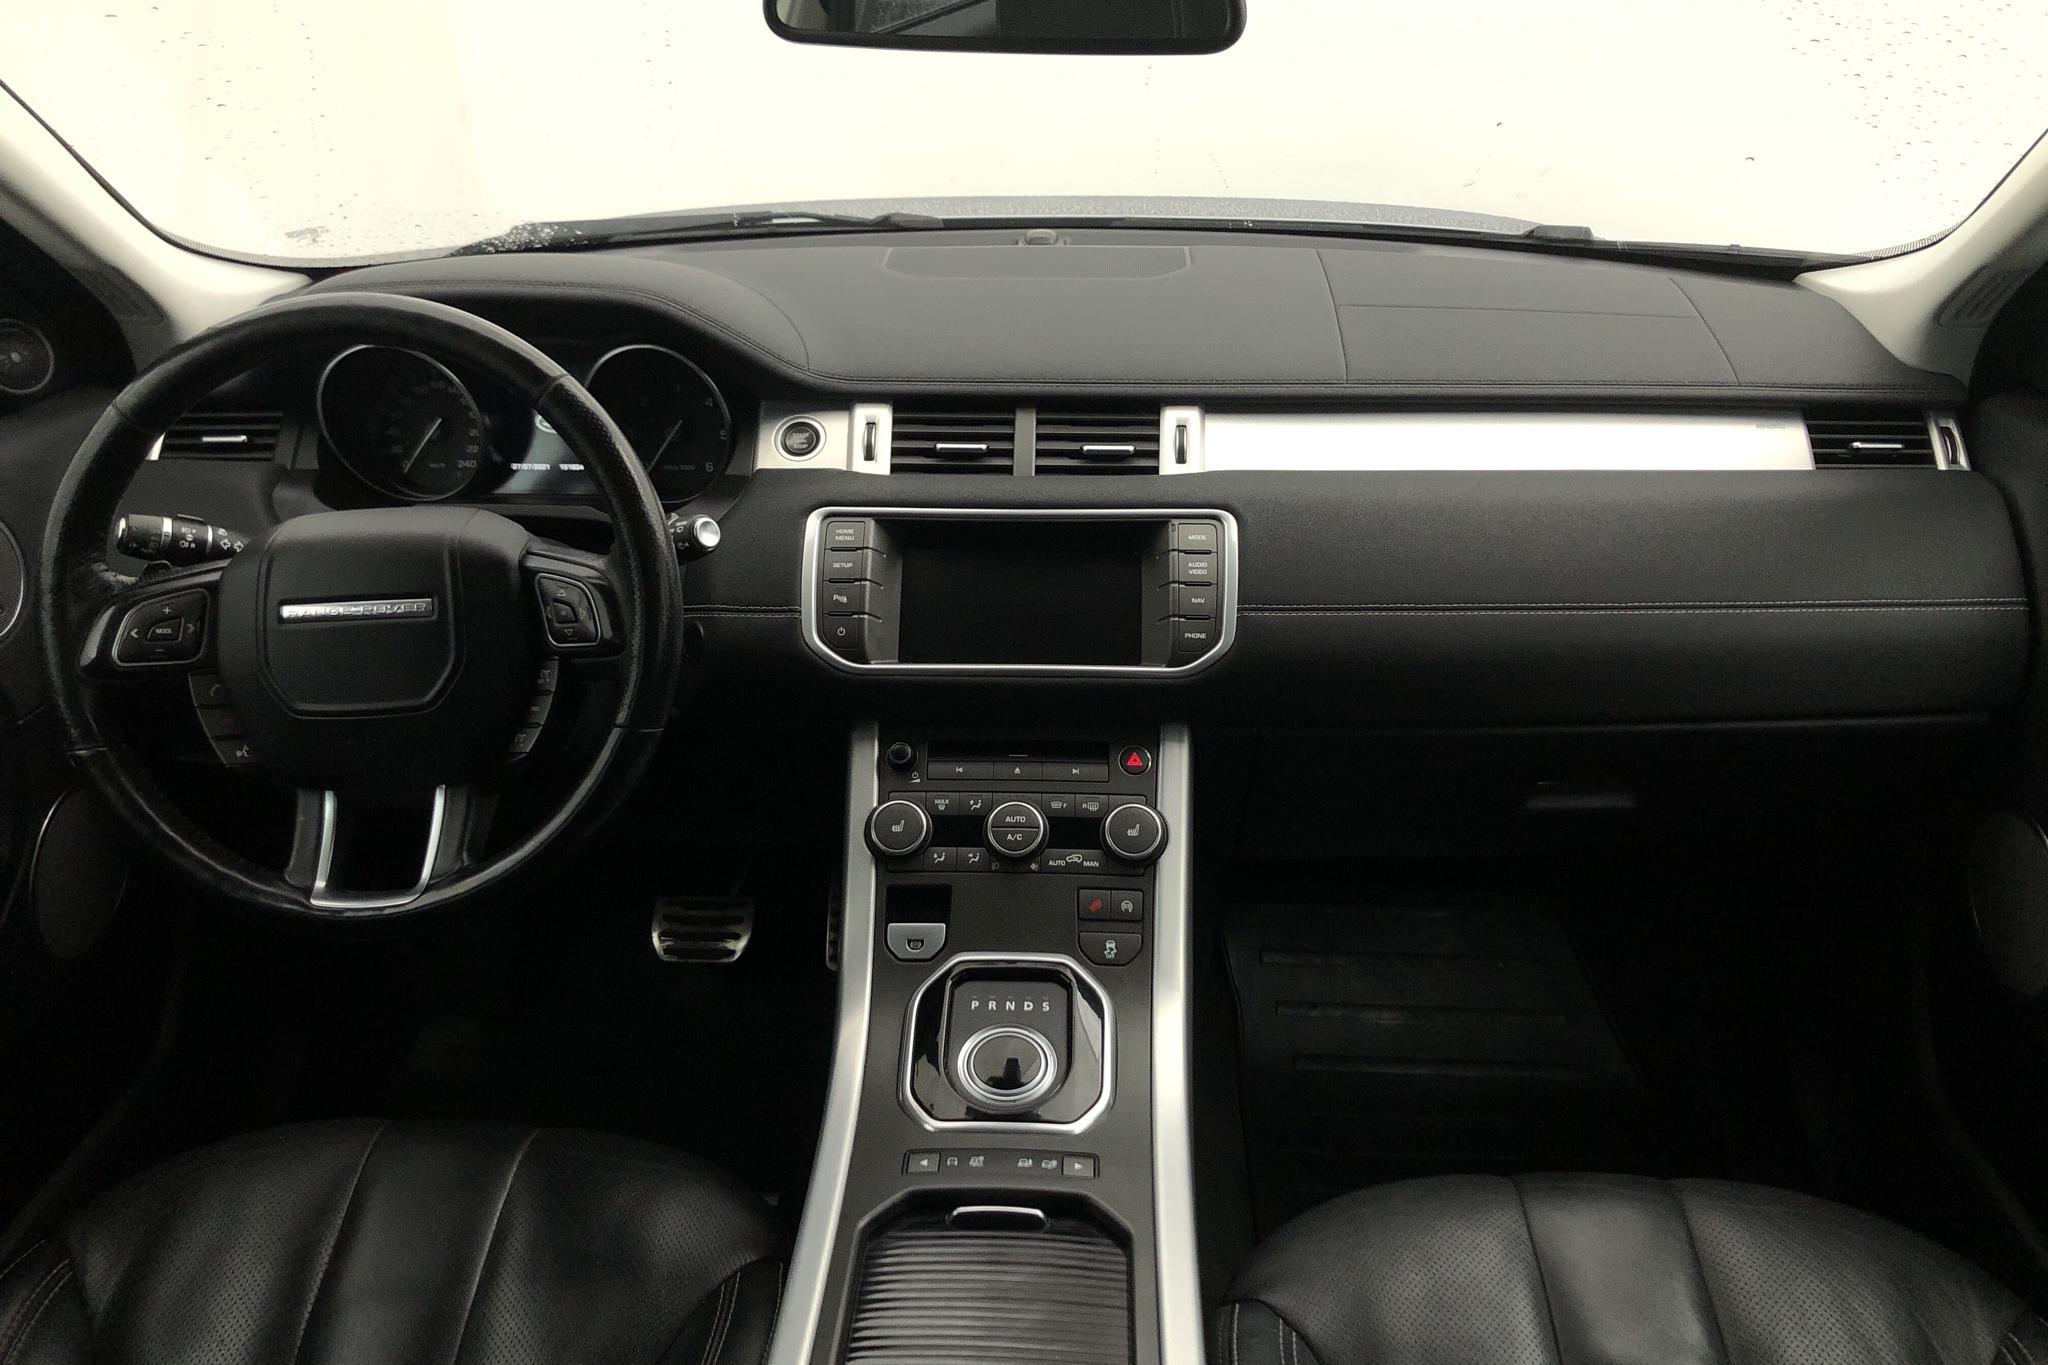 Land Rover Range Rover Evoque 2.2 SD4 5dr (190hk) - 151 600 km - Automatic - gray - 2014